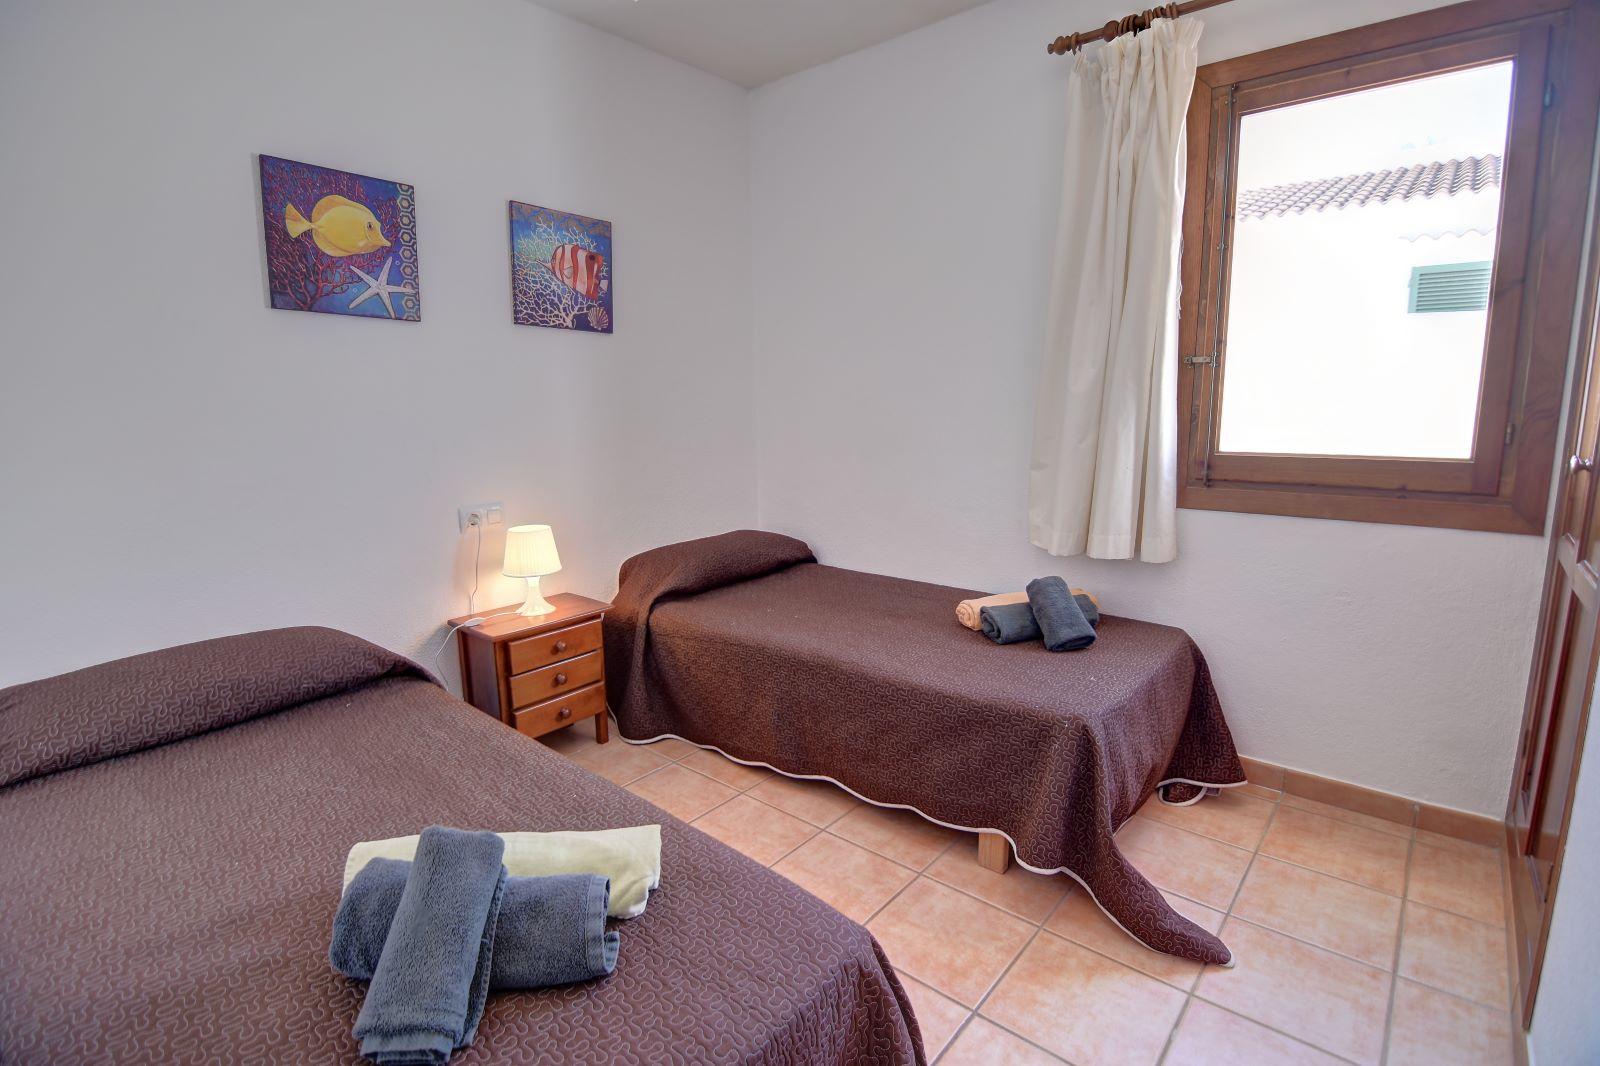 Villa in Cap D'Artruitx Ref: H2589 9